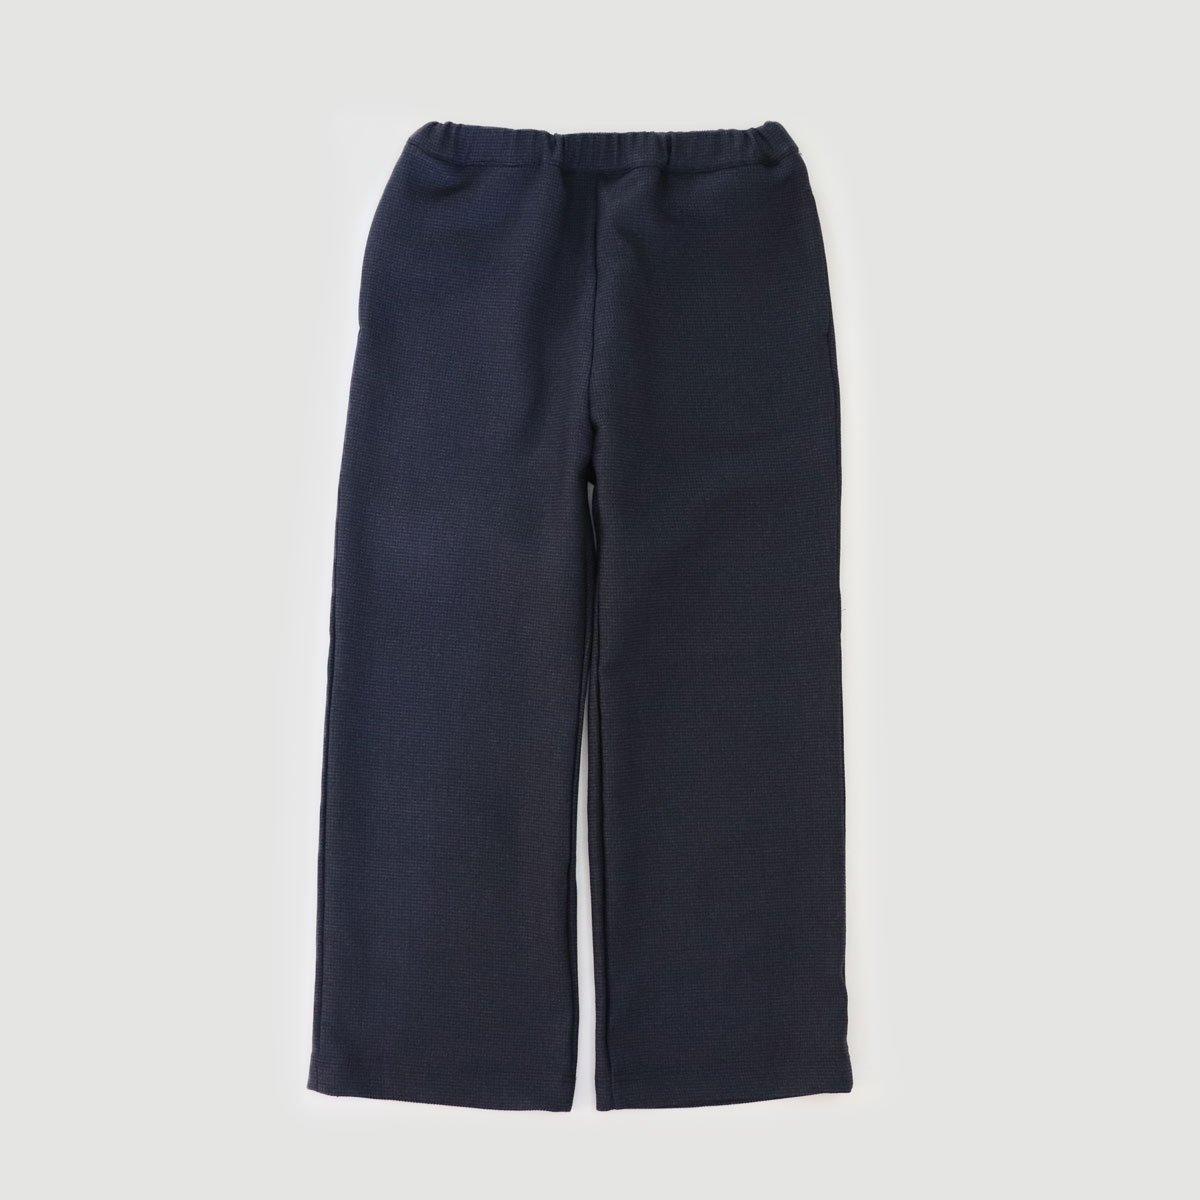 SHELL PANTS 詳細画像2